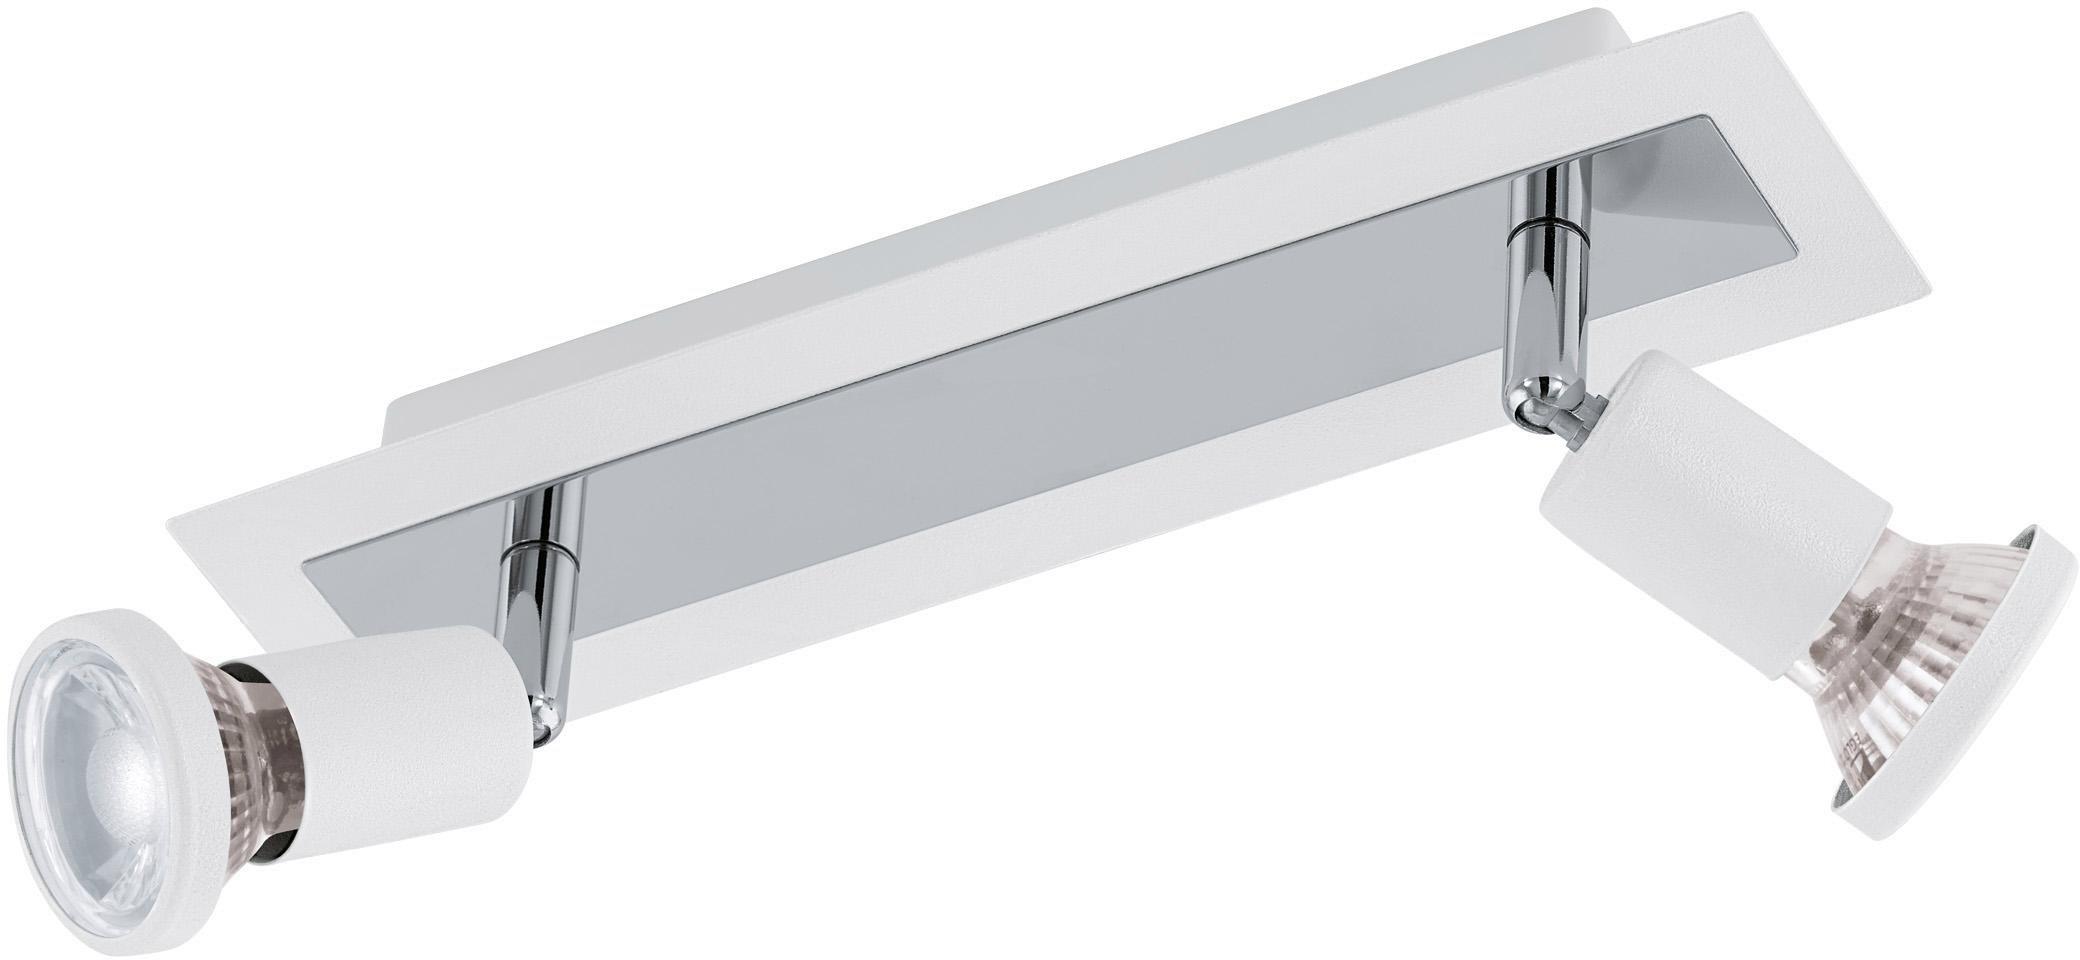 Eglo led-plafondspots »SARRIA«, nu online bestellen